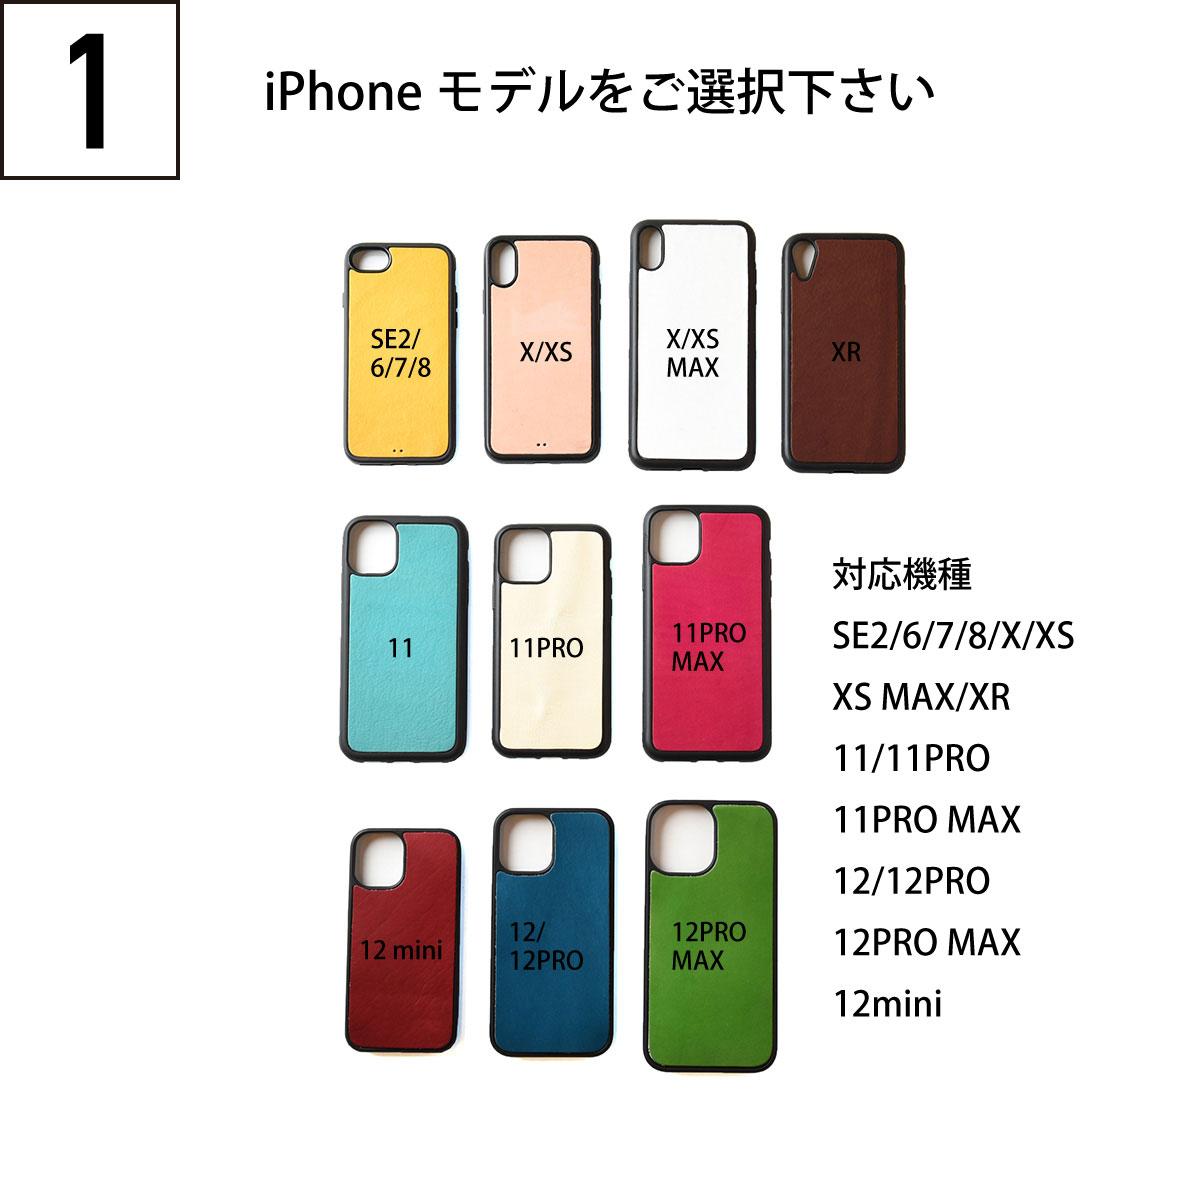 iPhoneOpenCase:   Design D:スマイルマーク刻印+名入れ